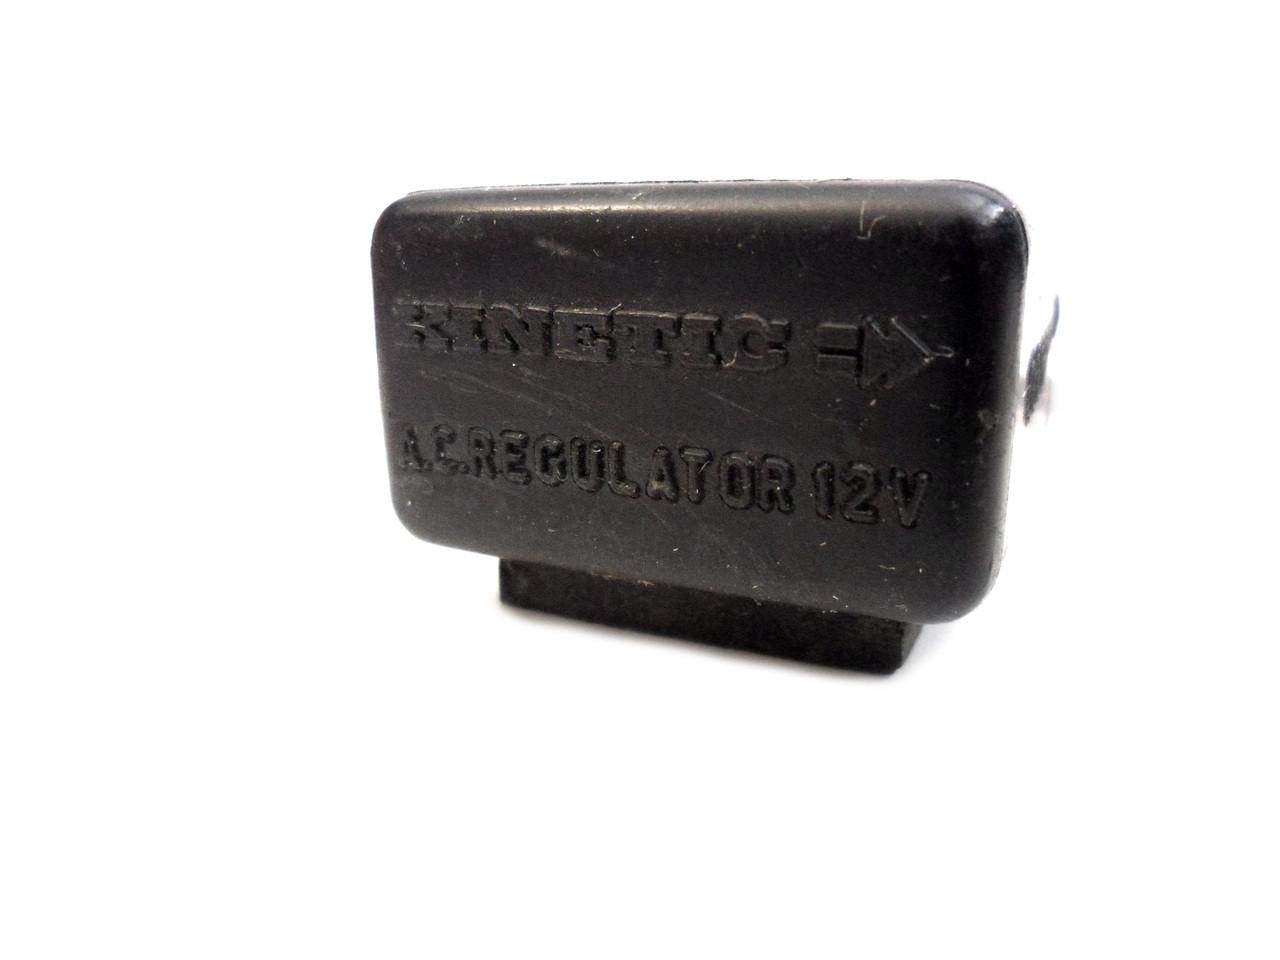 Original Kinetic Moped AC Voltage Regulator - 3 prong